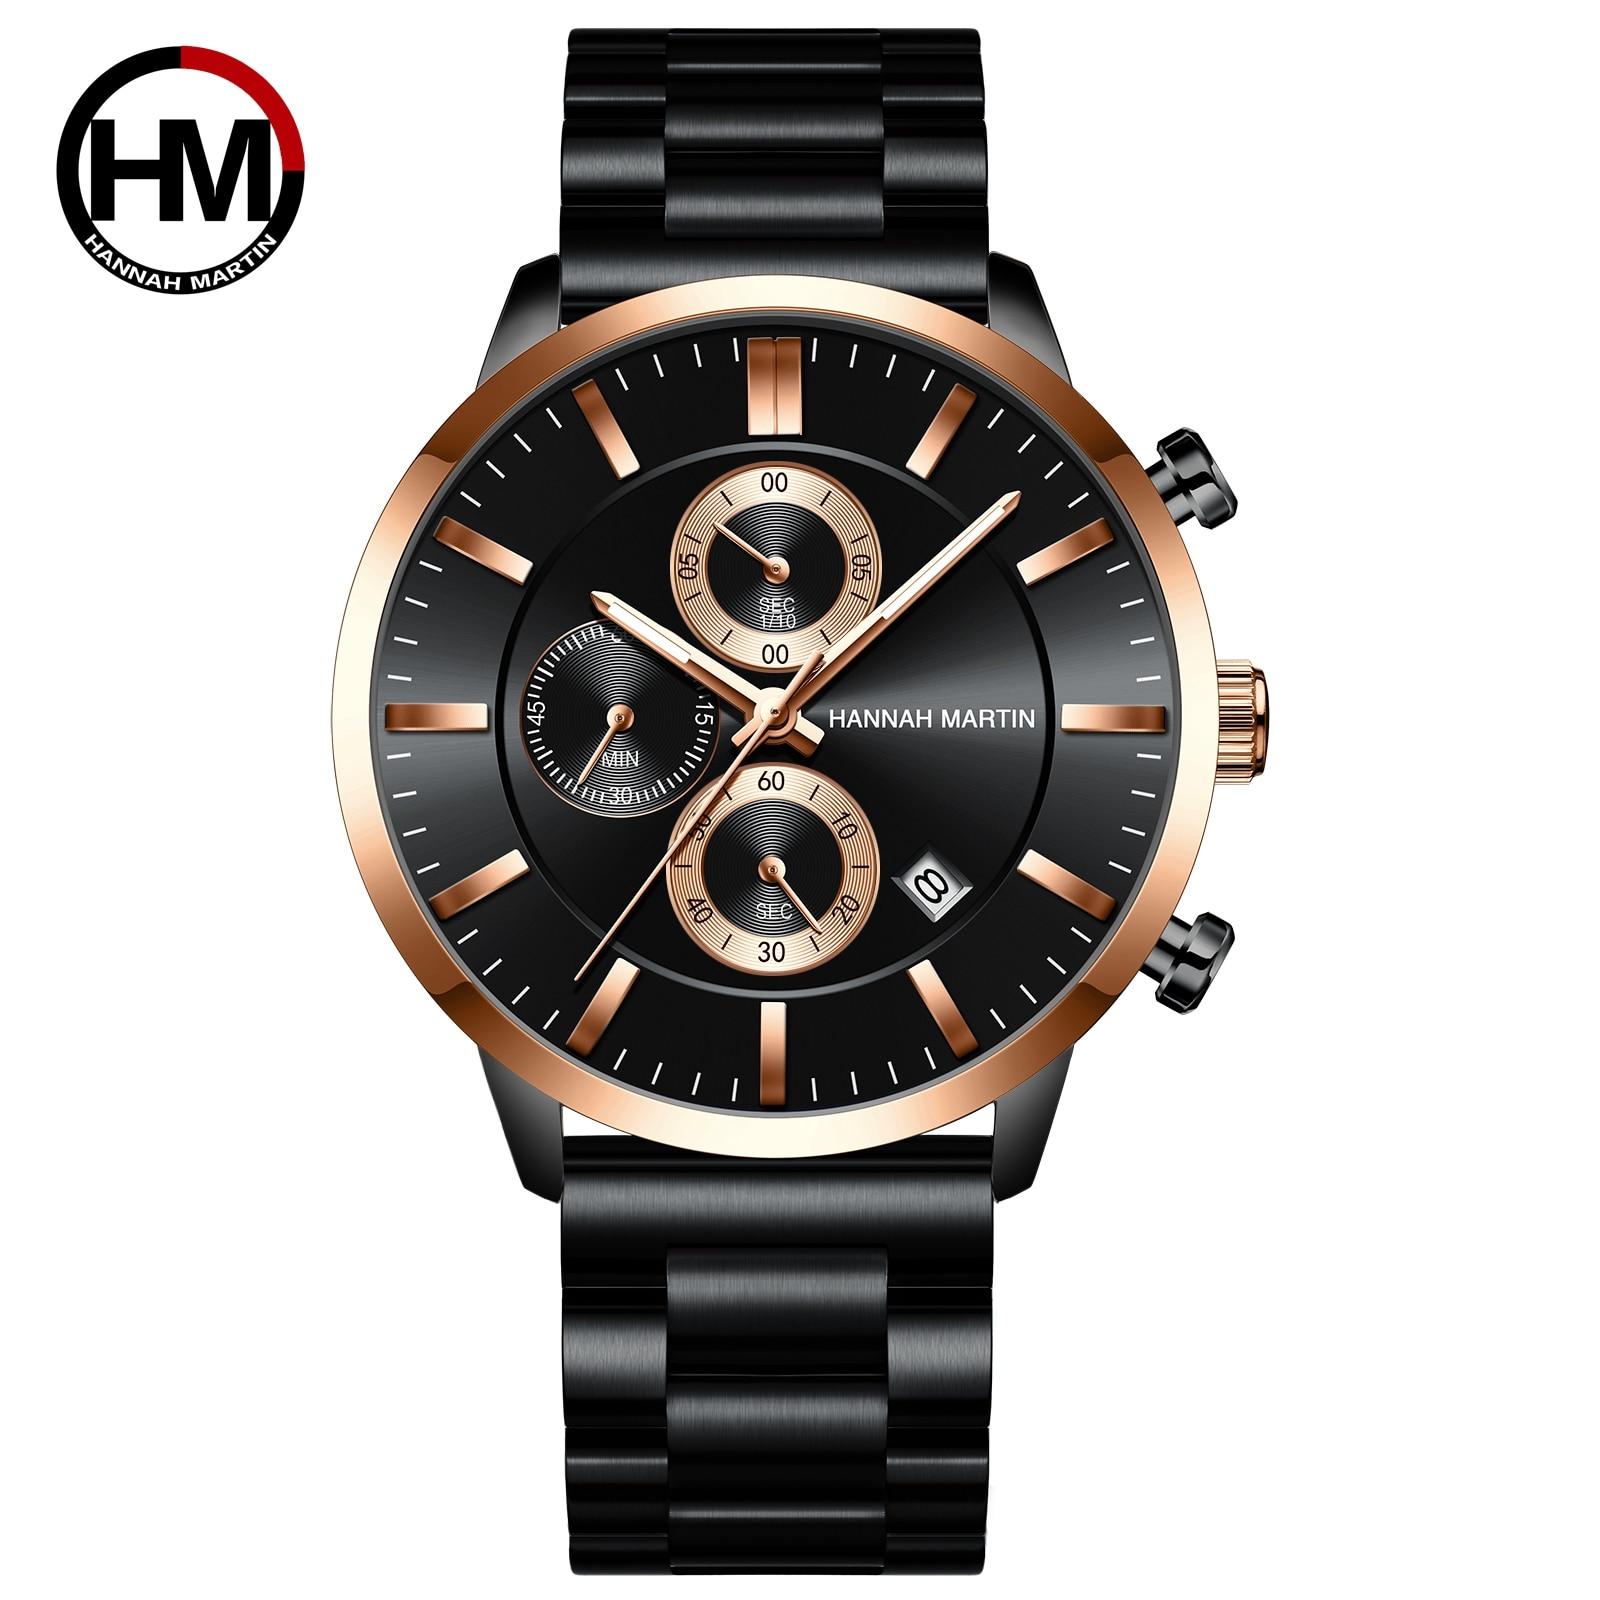 Hannah Martin Business Men\'s Watch Multi-Function Calendar Japan Quartz Movement Waterproof Watch Fashion Metal Band Wristwatch